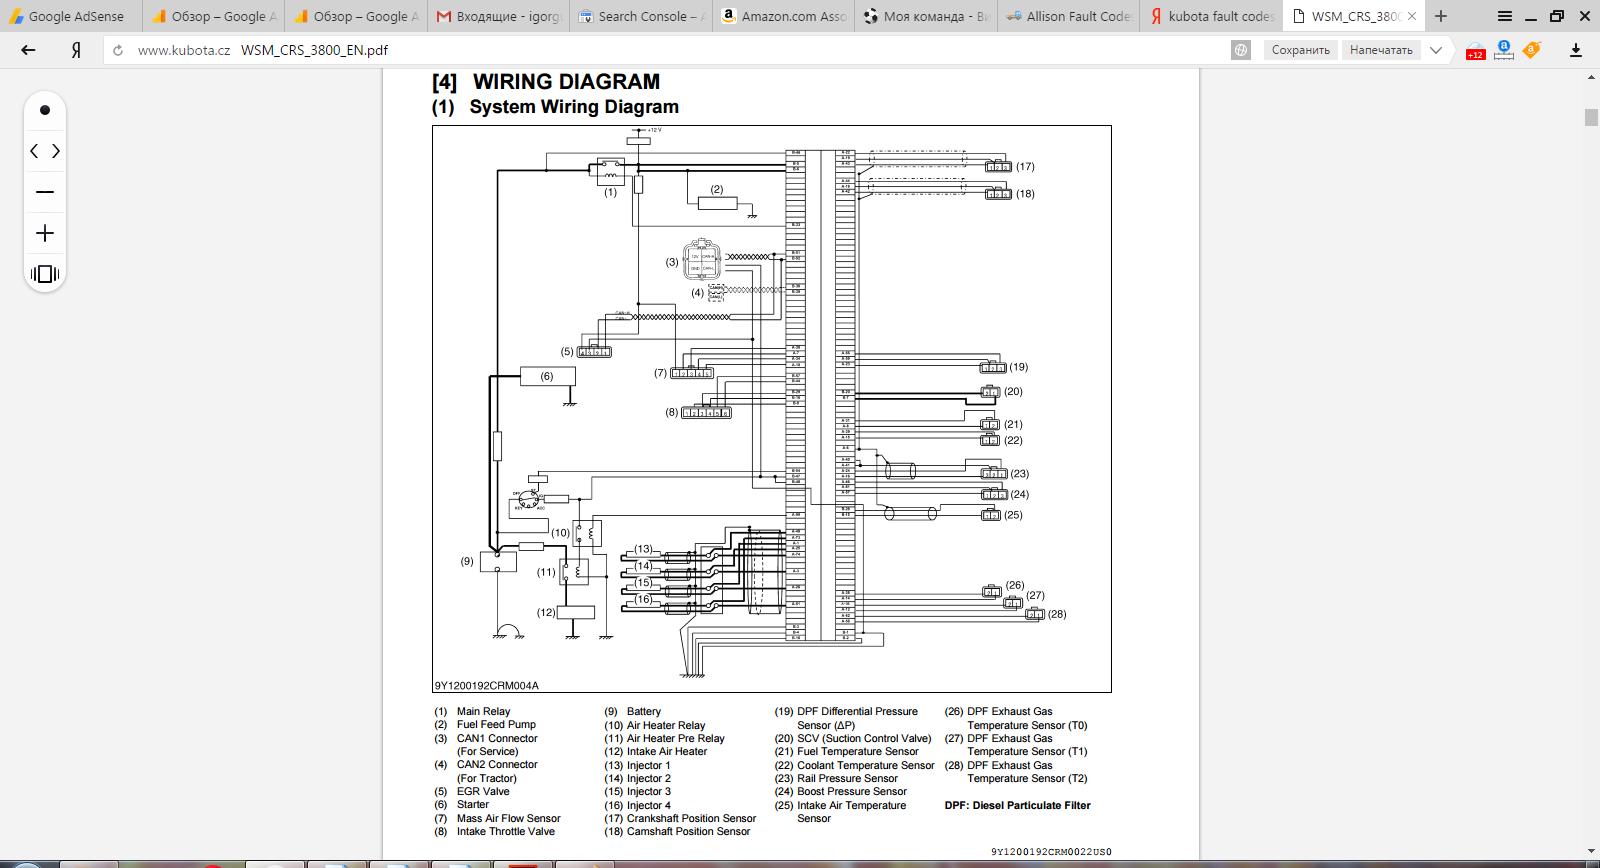 Kubota F2560 Wiring Diagram Wire Schematic Electronic Thermometer Circuit Measuringandtestcircuit B2400 Elsalvadorla Hydrostatic Transmission Maintenance